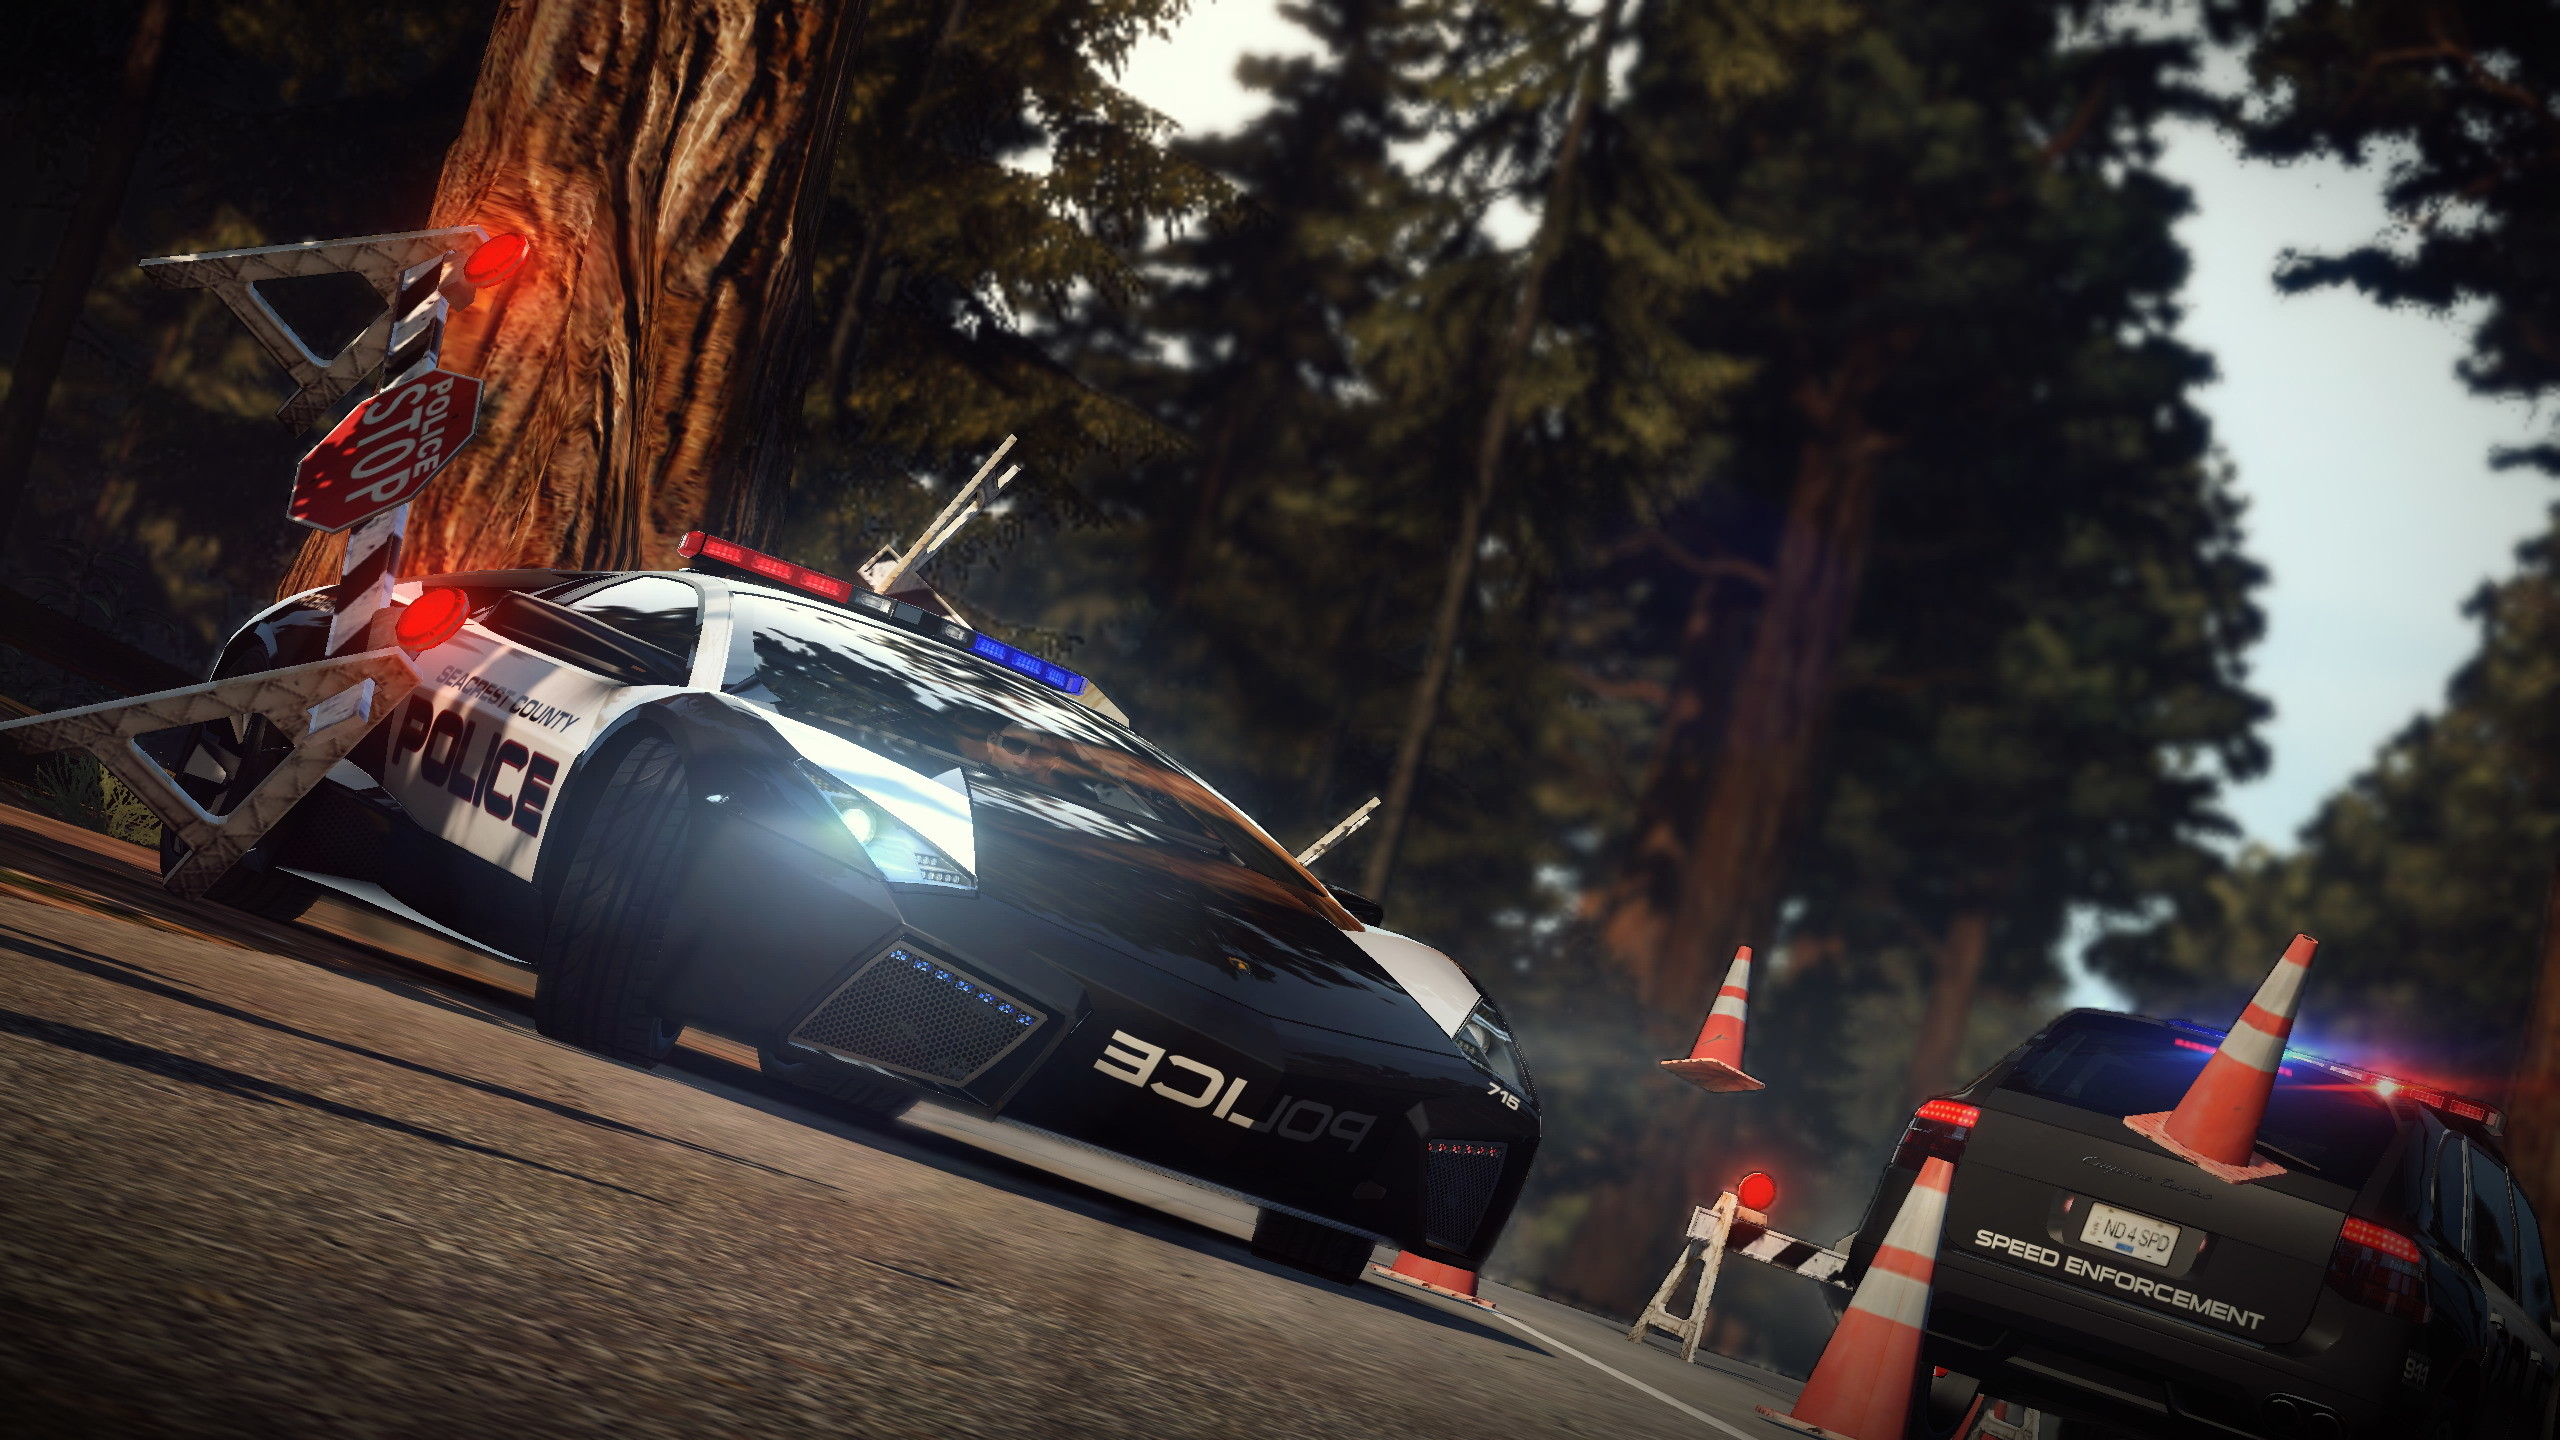 Need For Speed Hot Pursuit Police Car… Desktop Wallpaper